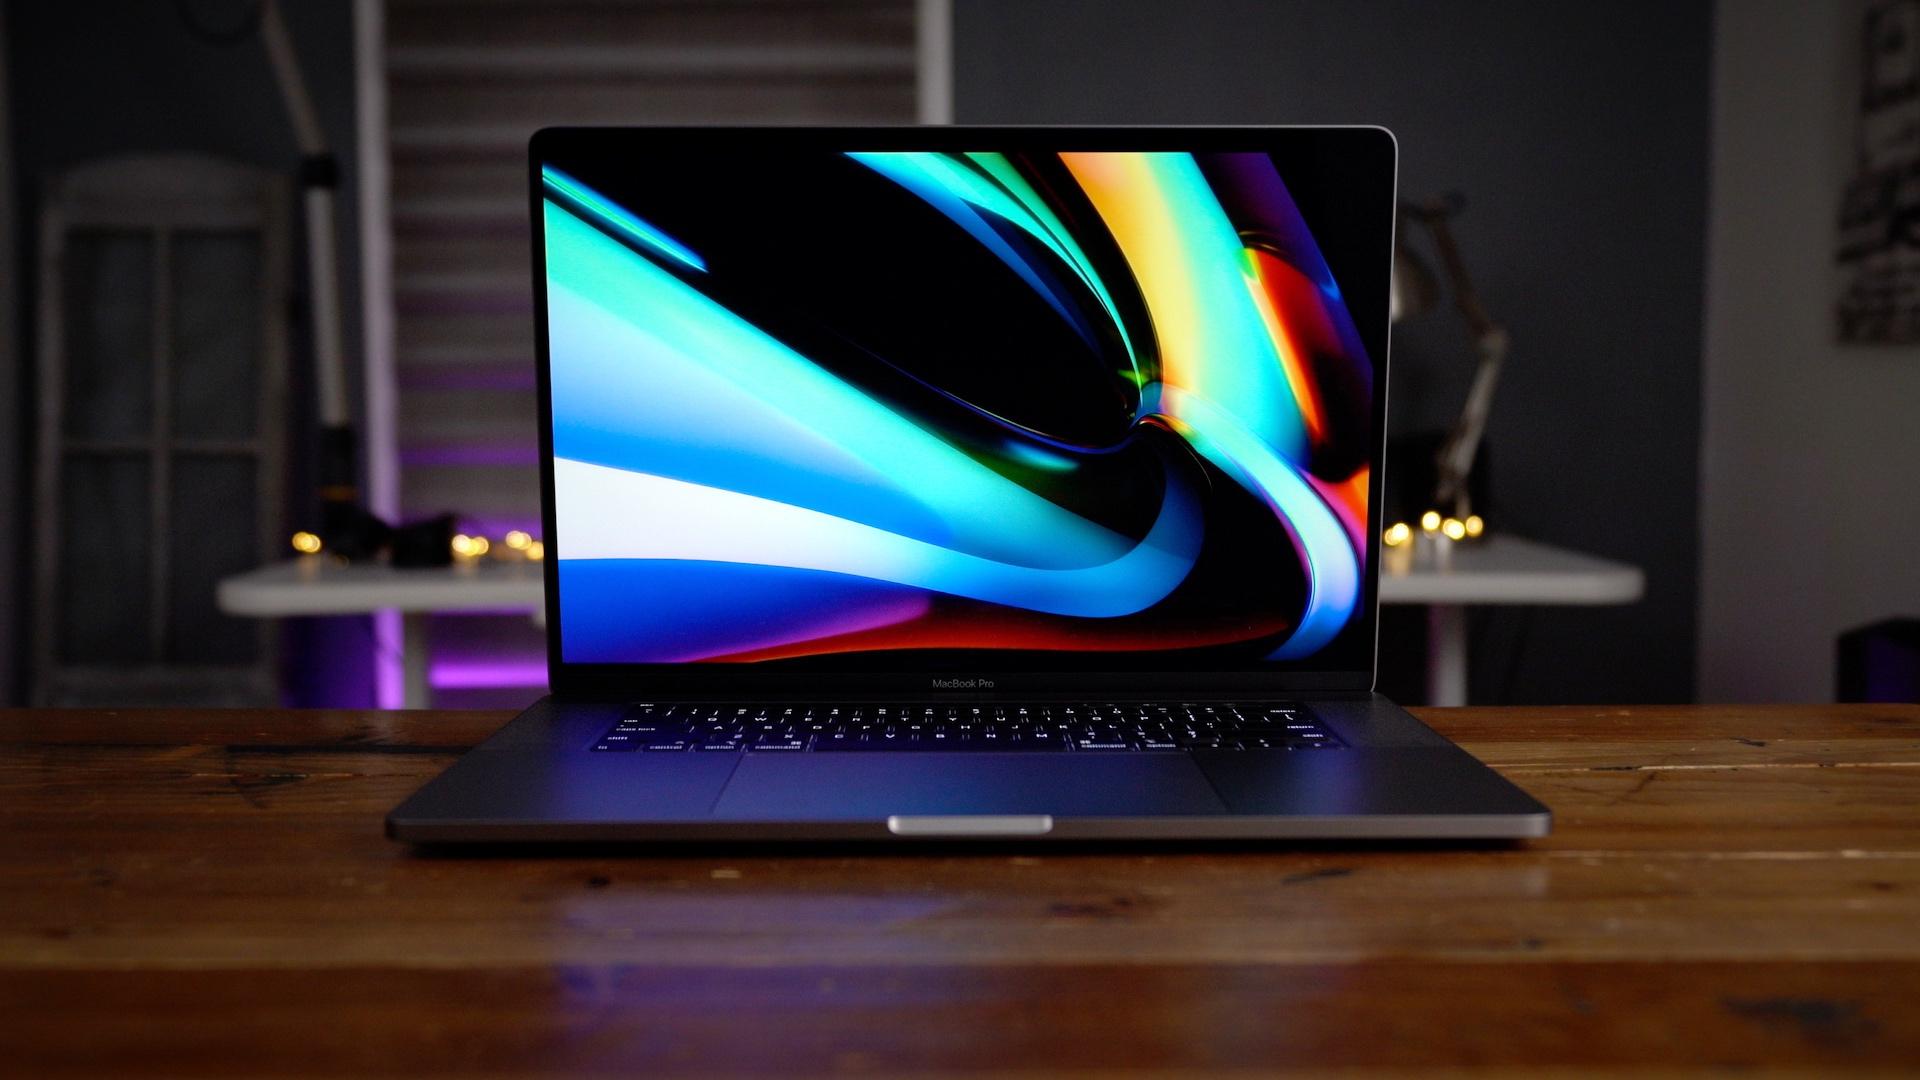 16 inch MacBook Pro 2019 1 jpg?quality=82&strip=all.'